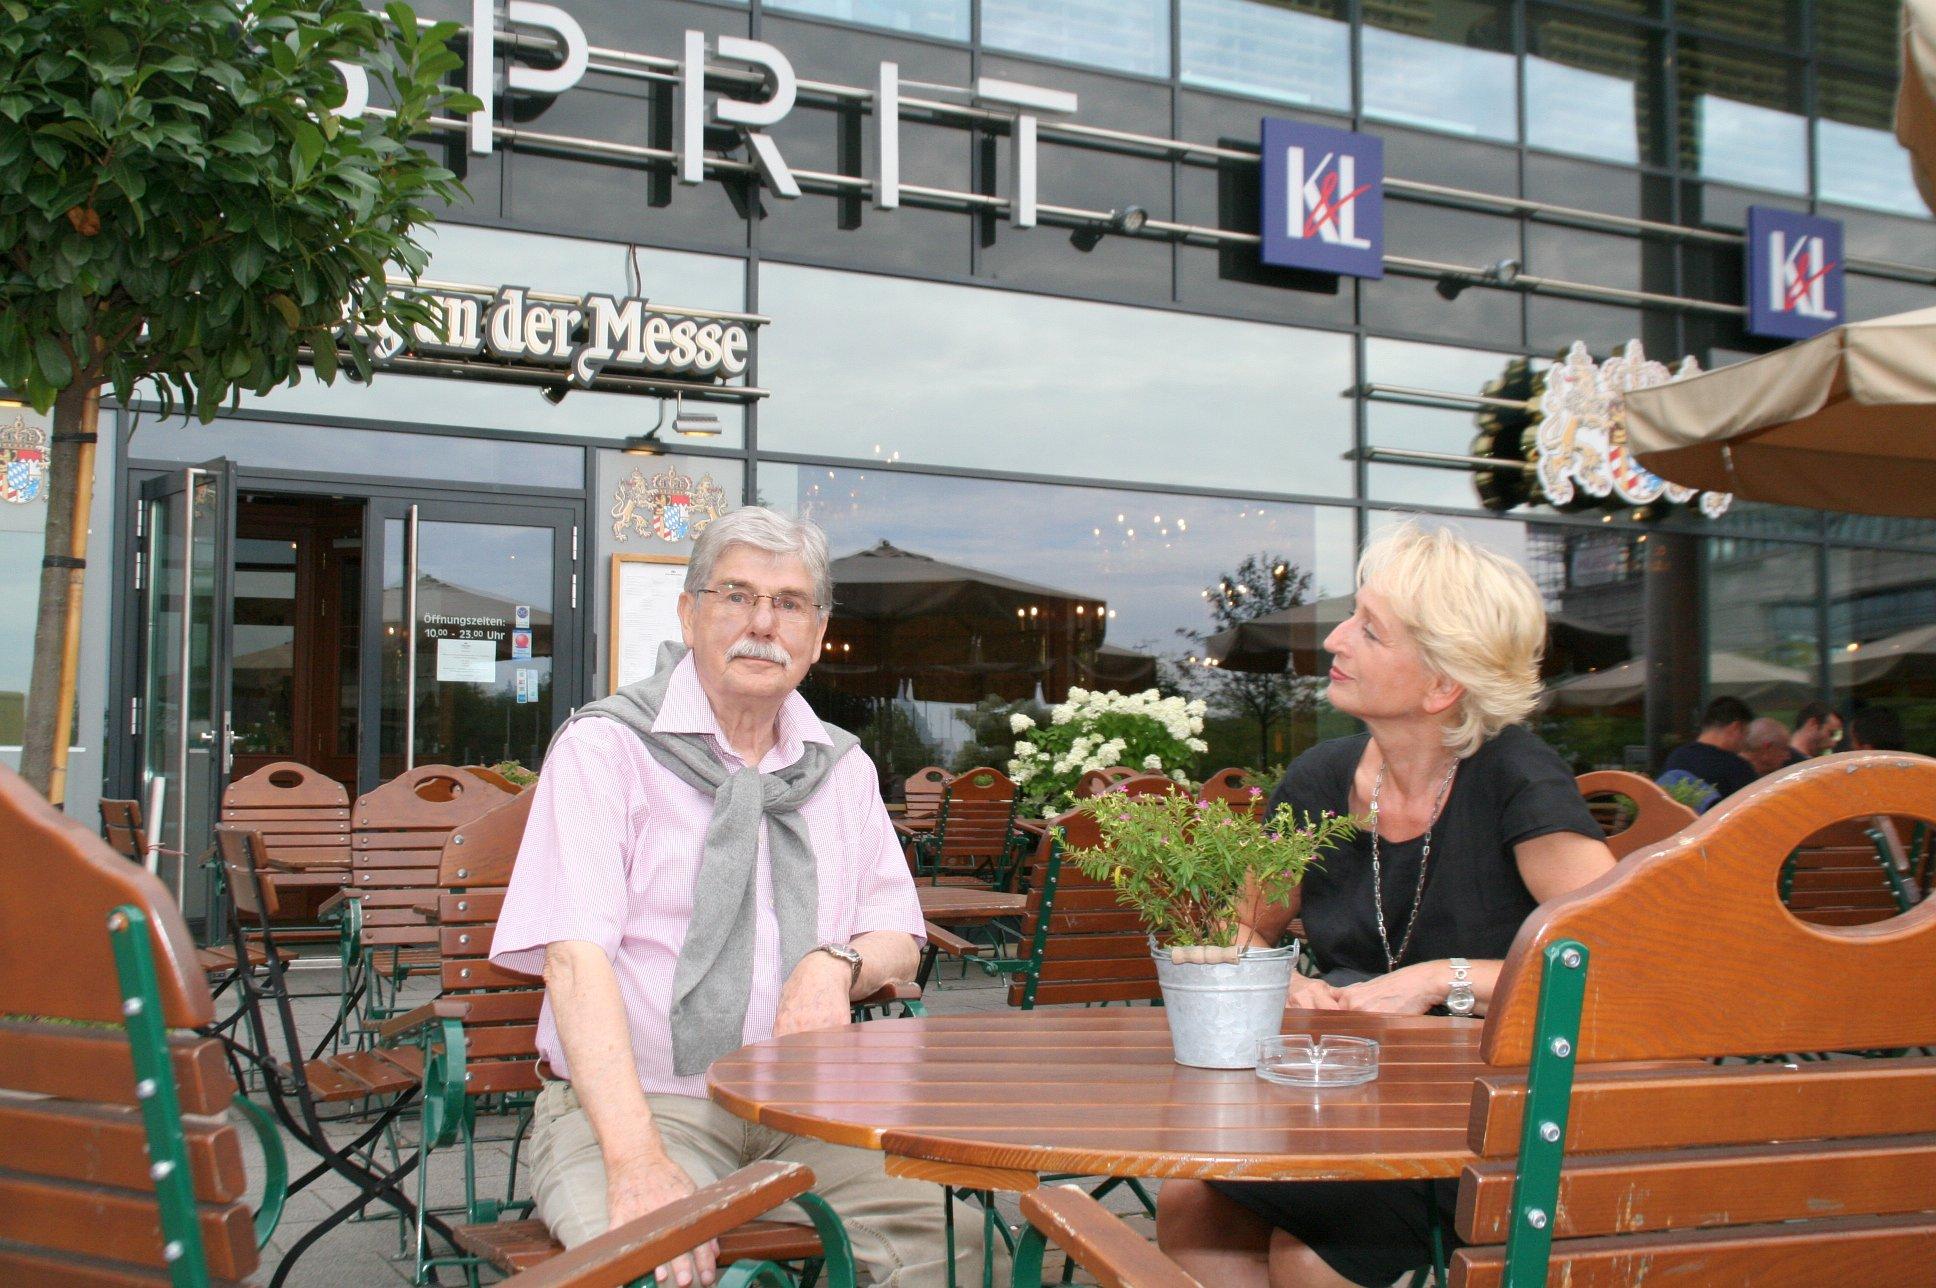 seniorenbetreuung-muenchen-lebensfreude-66-plus-ausgehen